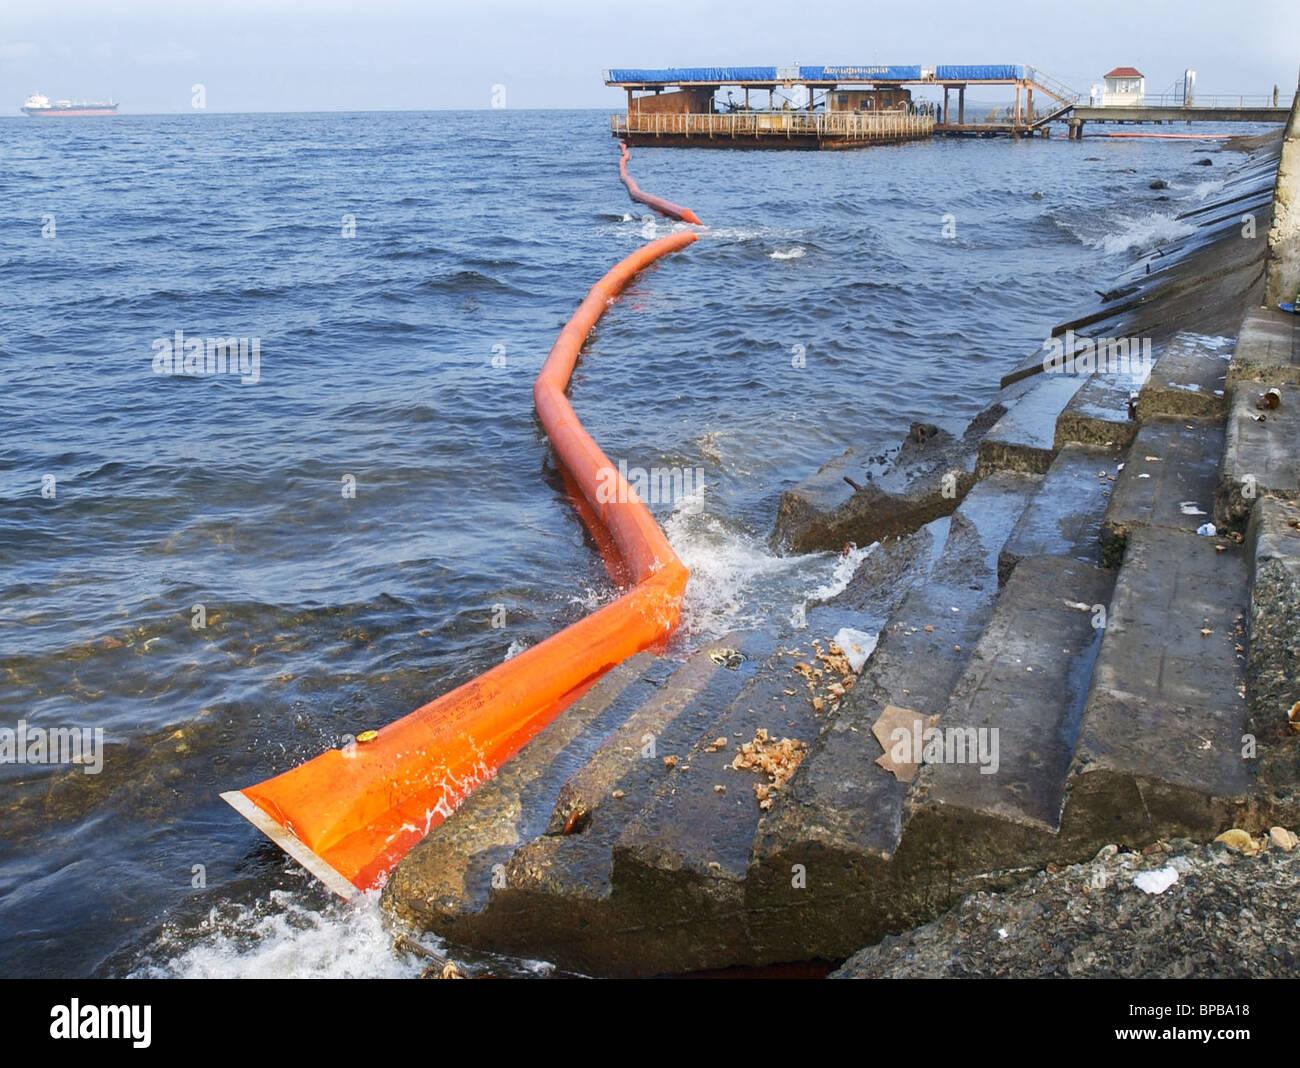 Cleanup operation at the Vladivistok seaquarium - Stock Image